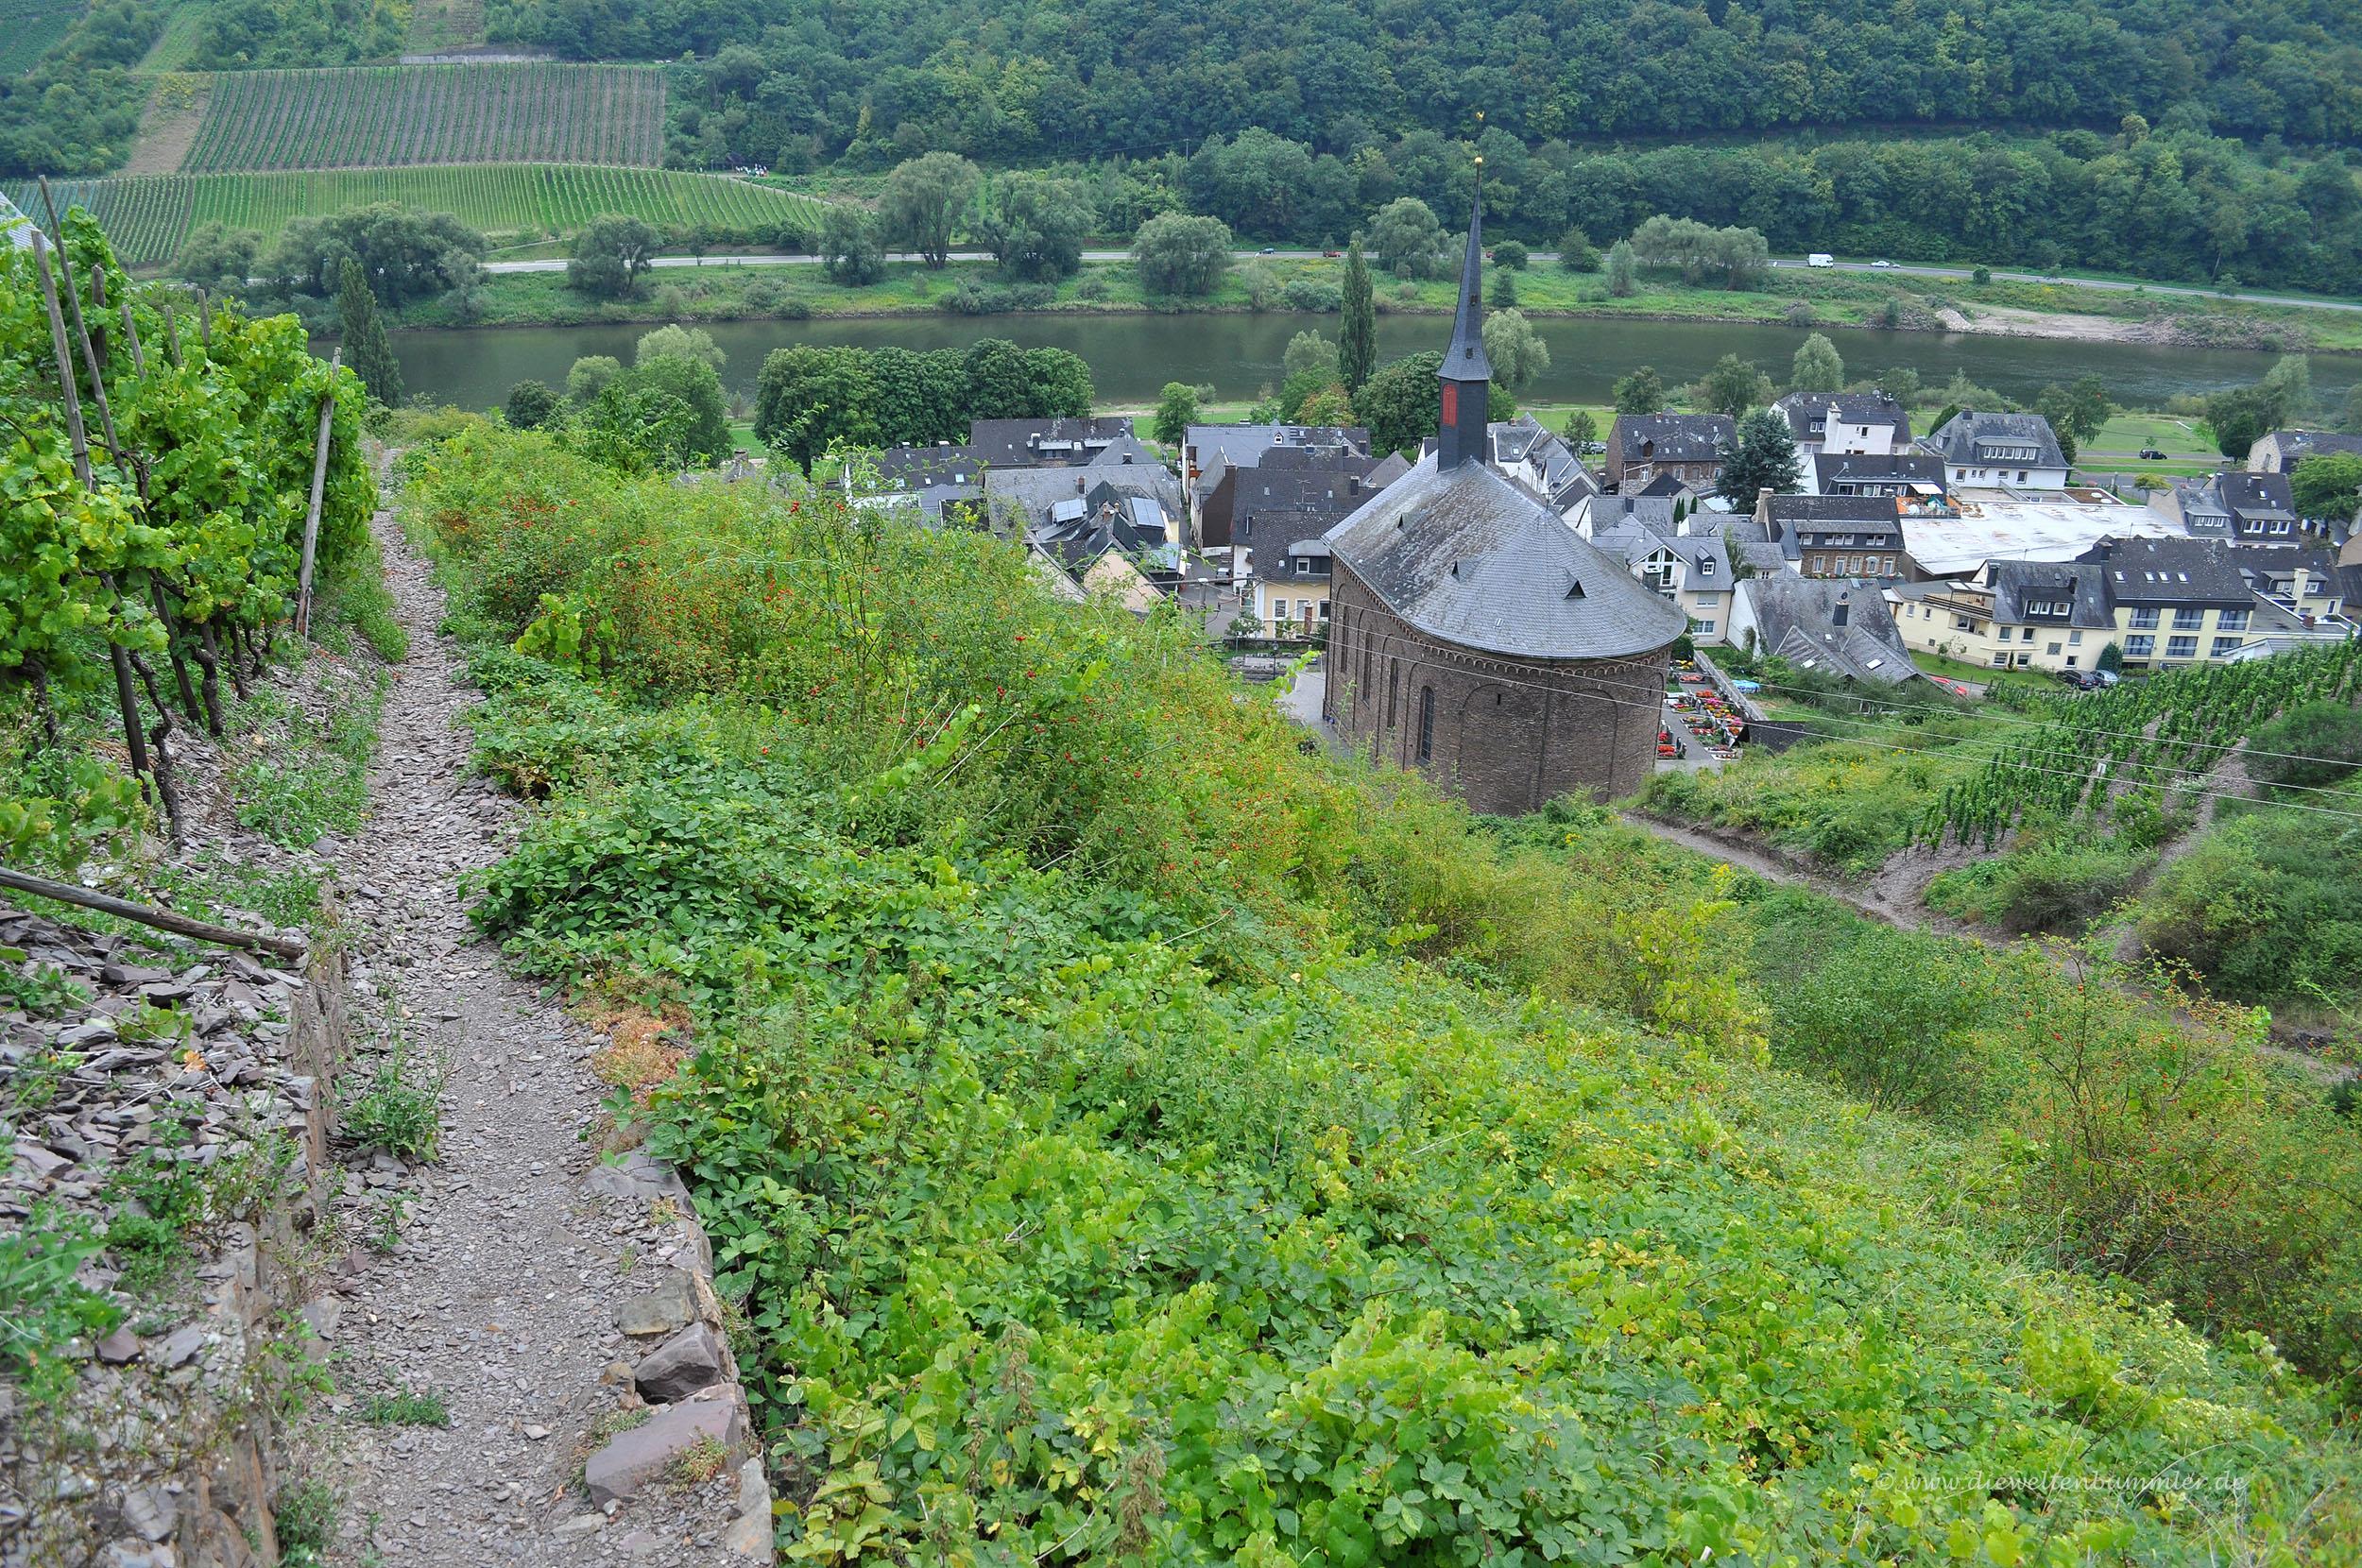 Apolloweg oberhalb von Valwig